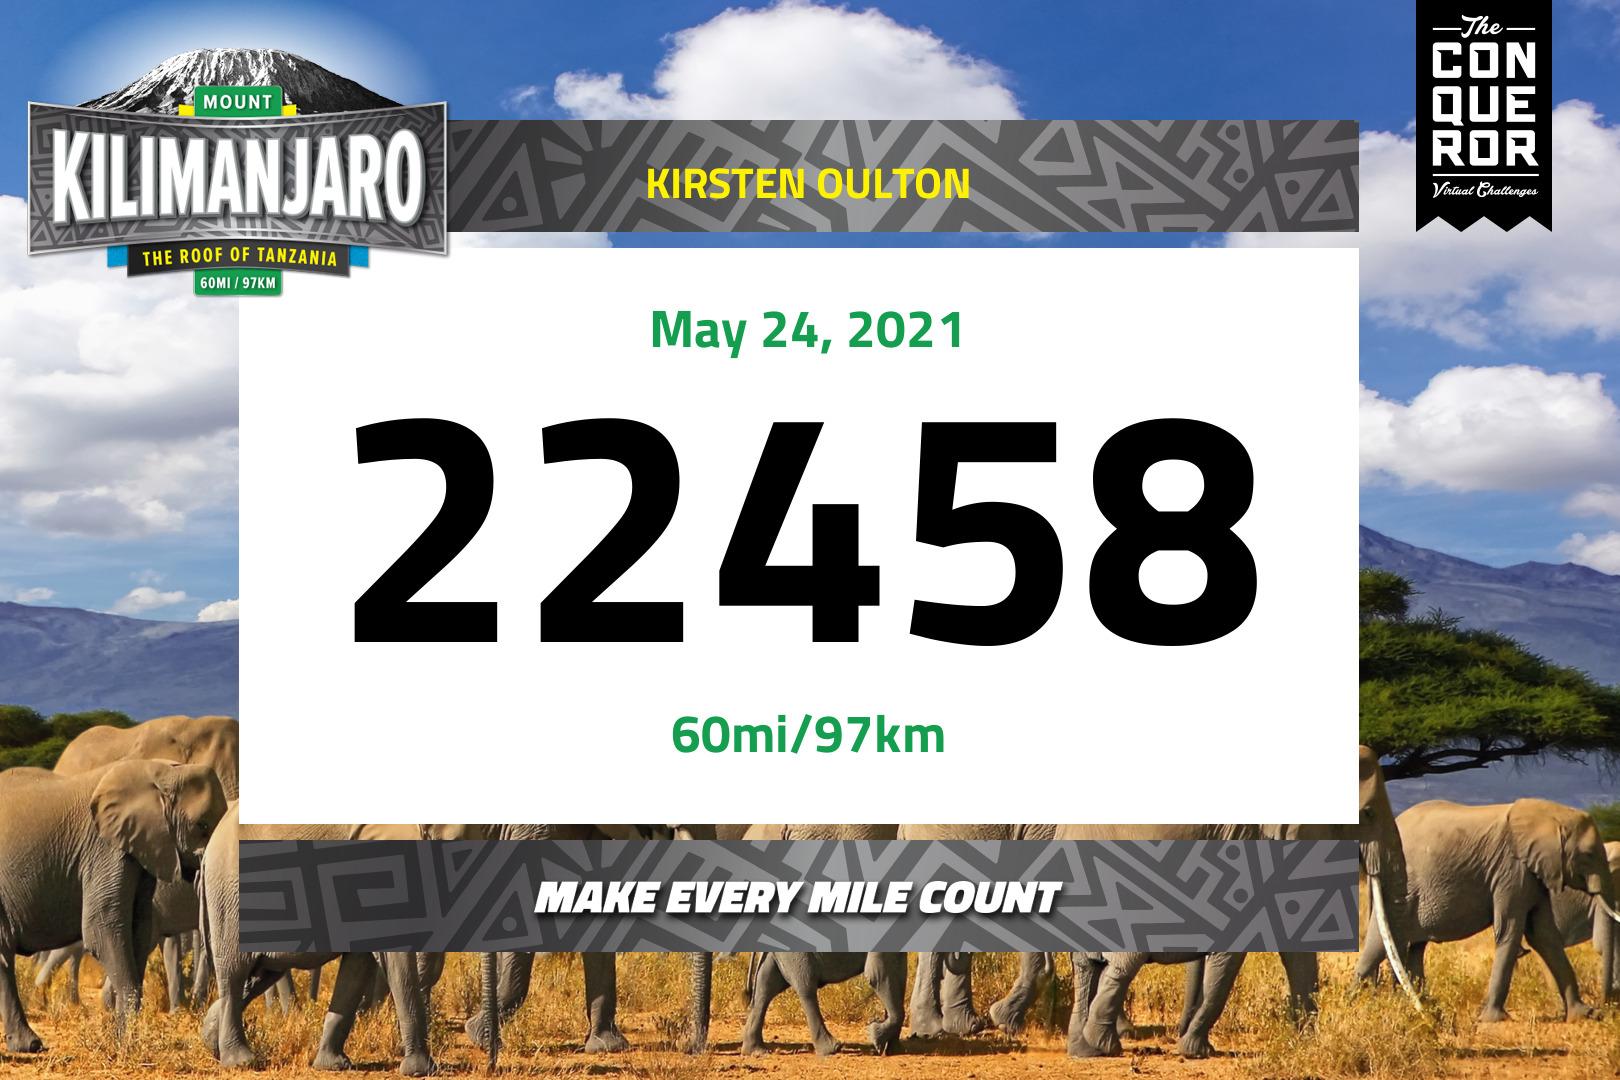 Kilimanjaro Race Bib